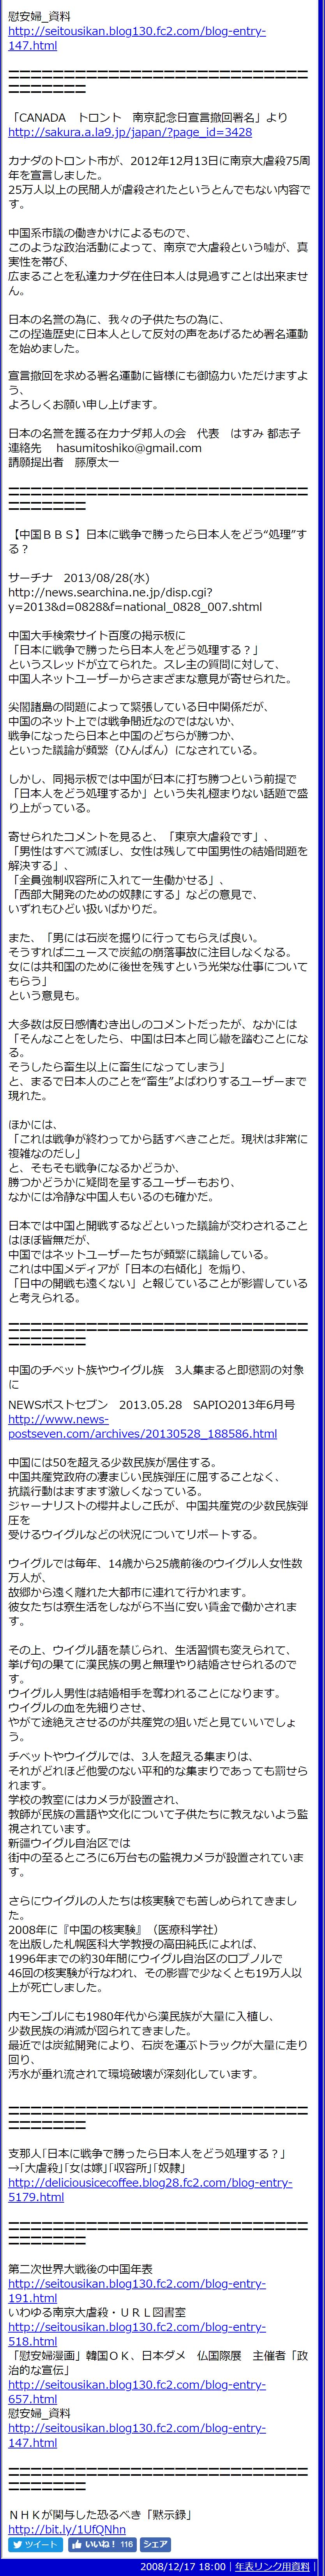 NHKが関与した恐るべき「黙示録」2_2